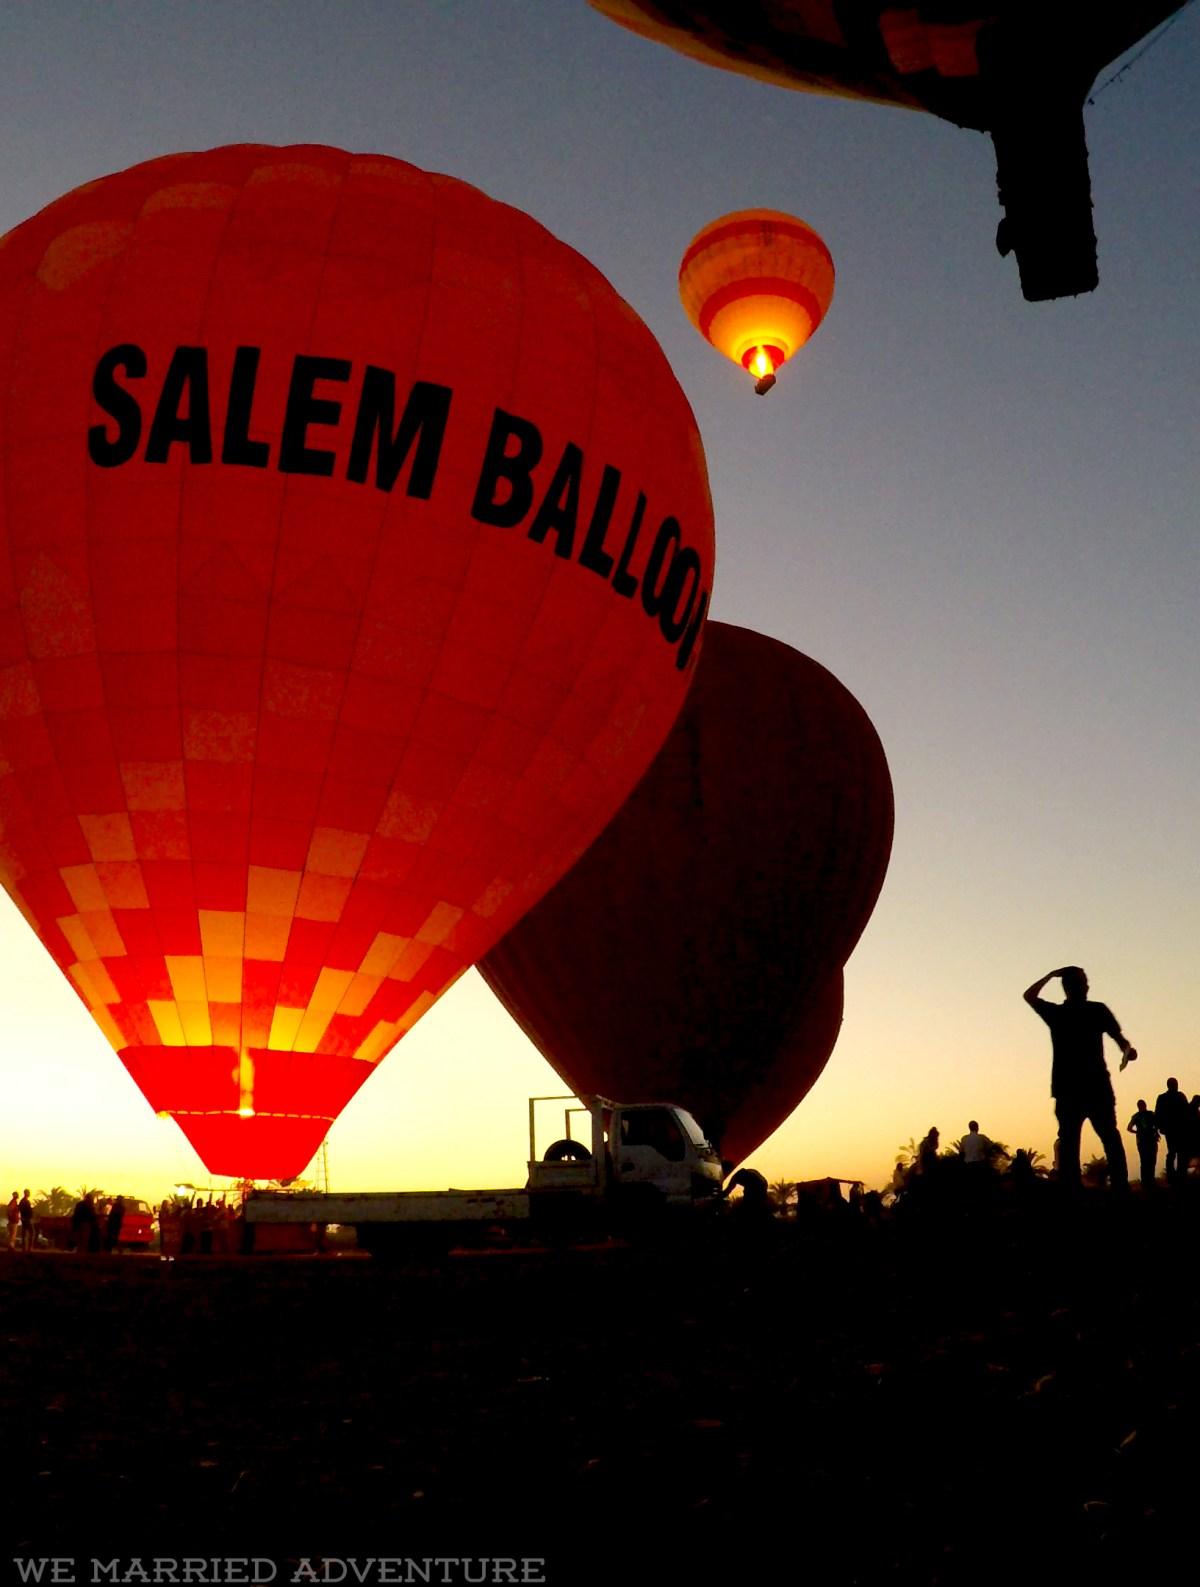 balloons04_wm